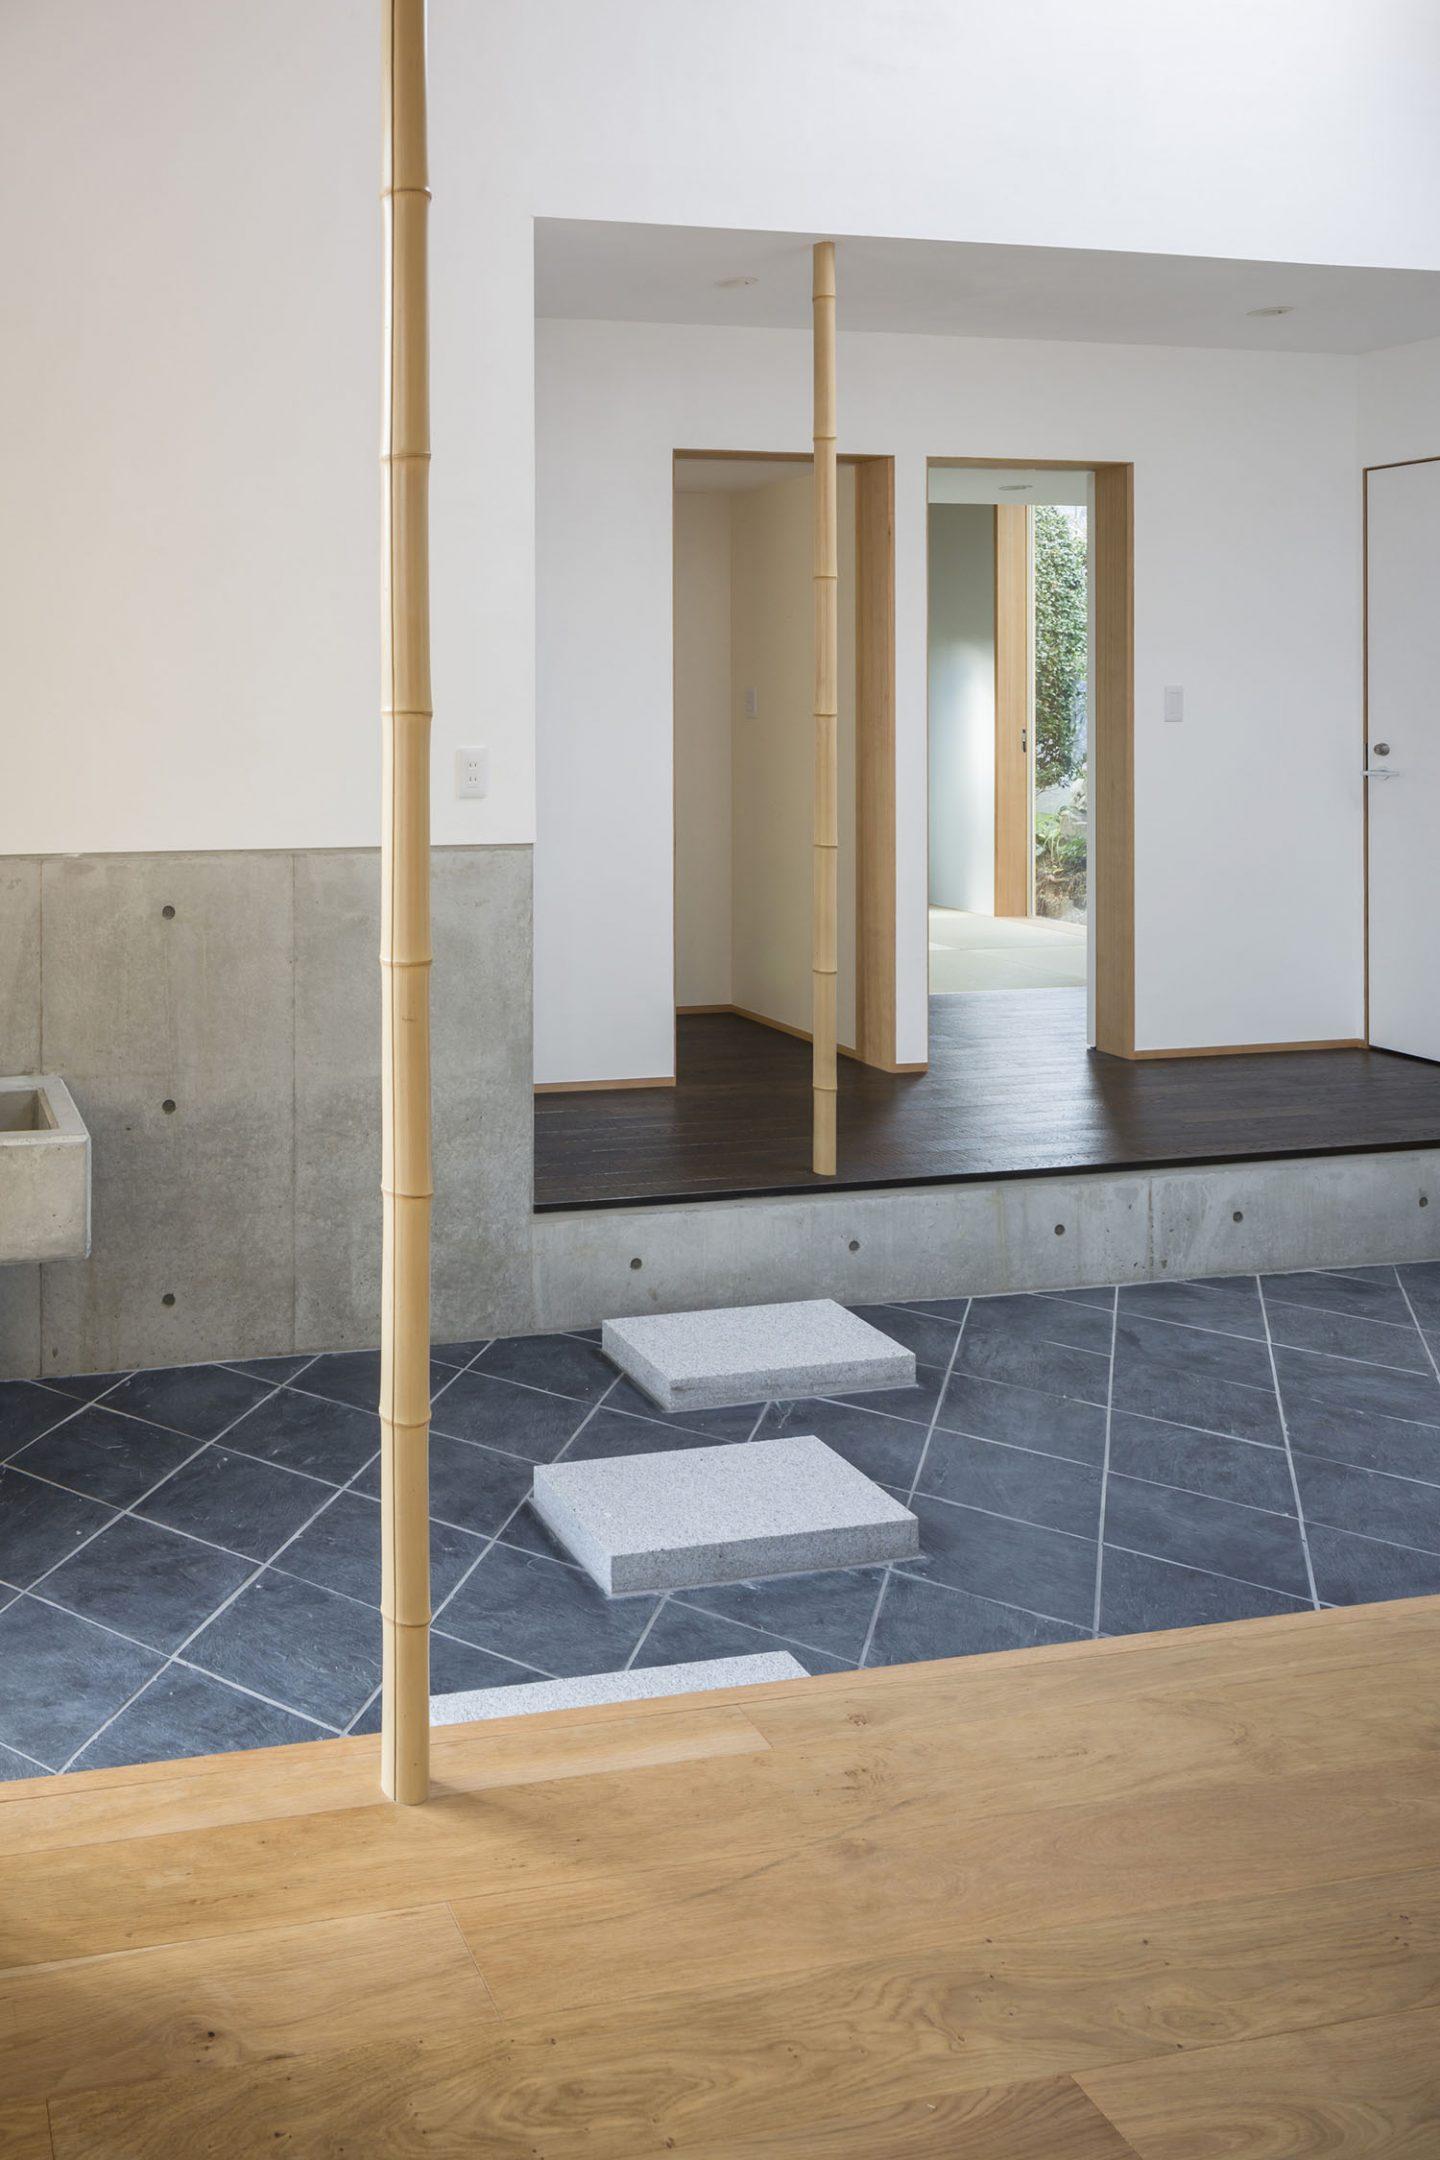 iGNANT_Architecture_Araki_Sasaski_Weekend_House_Kumano_8